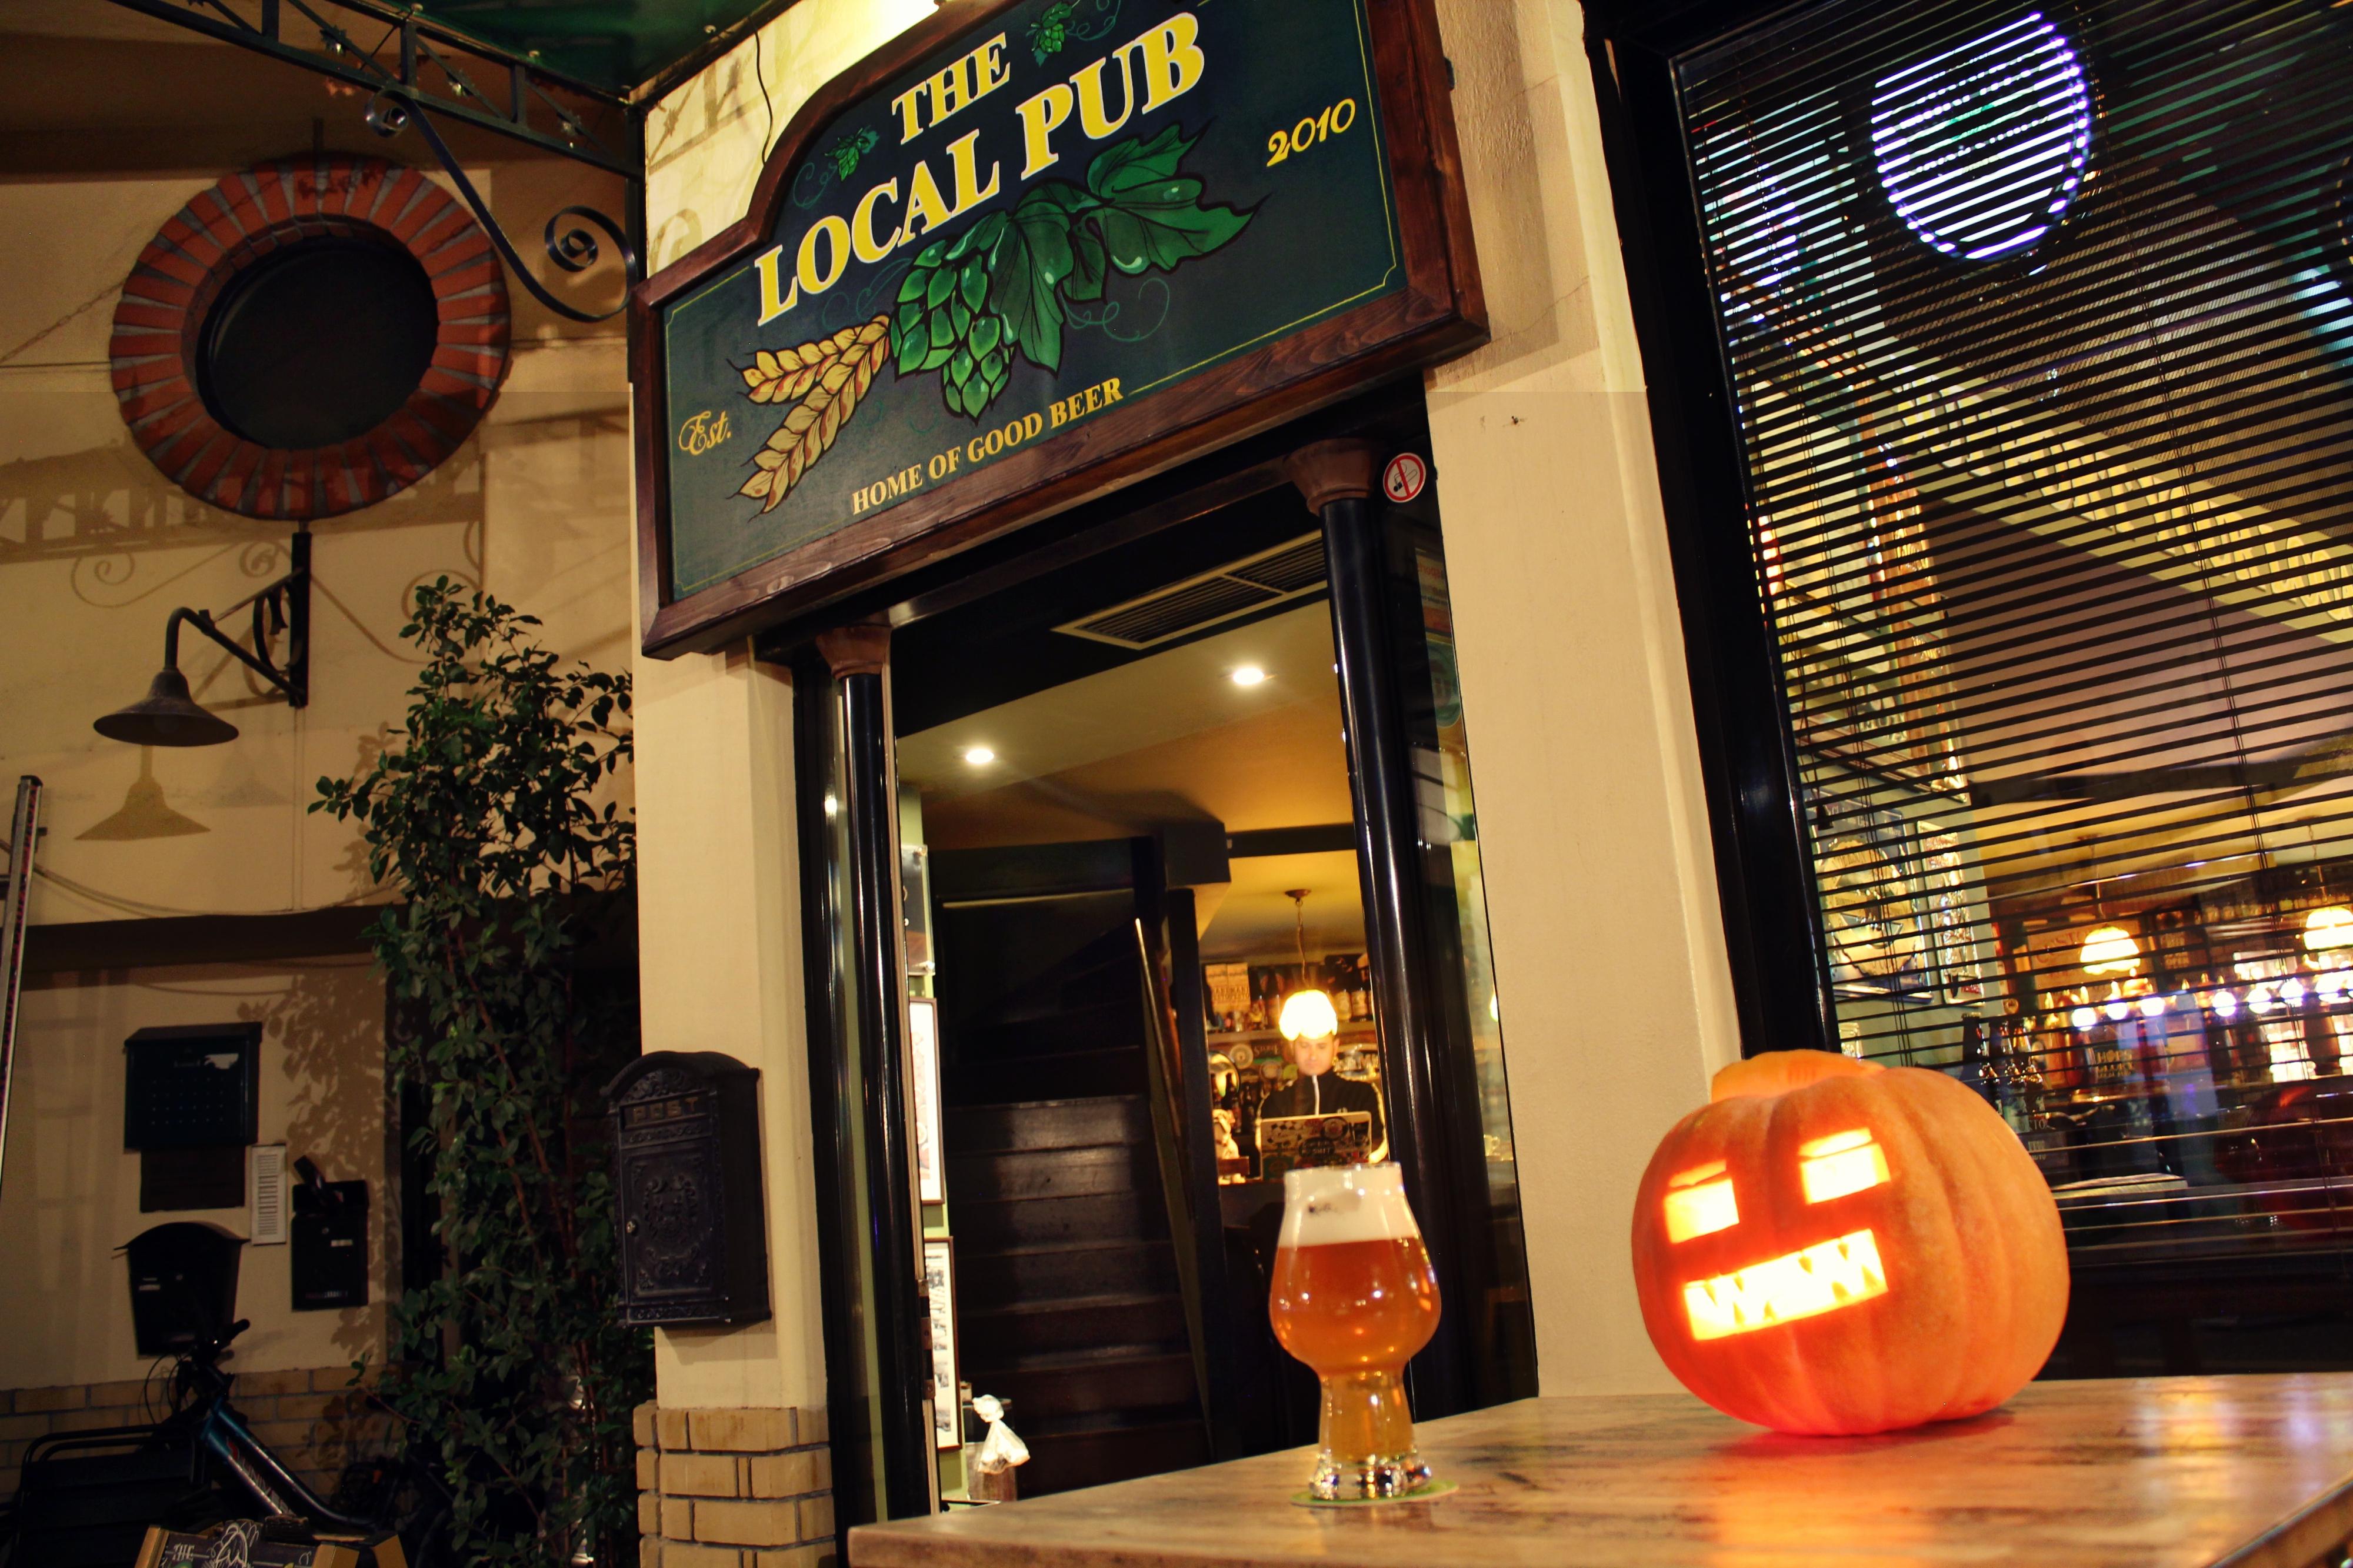 H Local Pub στο Χαλάνδρι είναι το βασικό σημείο πώλησης της Menace στην Αθήνα